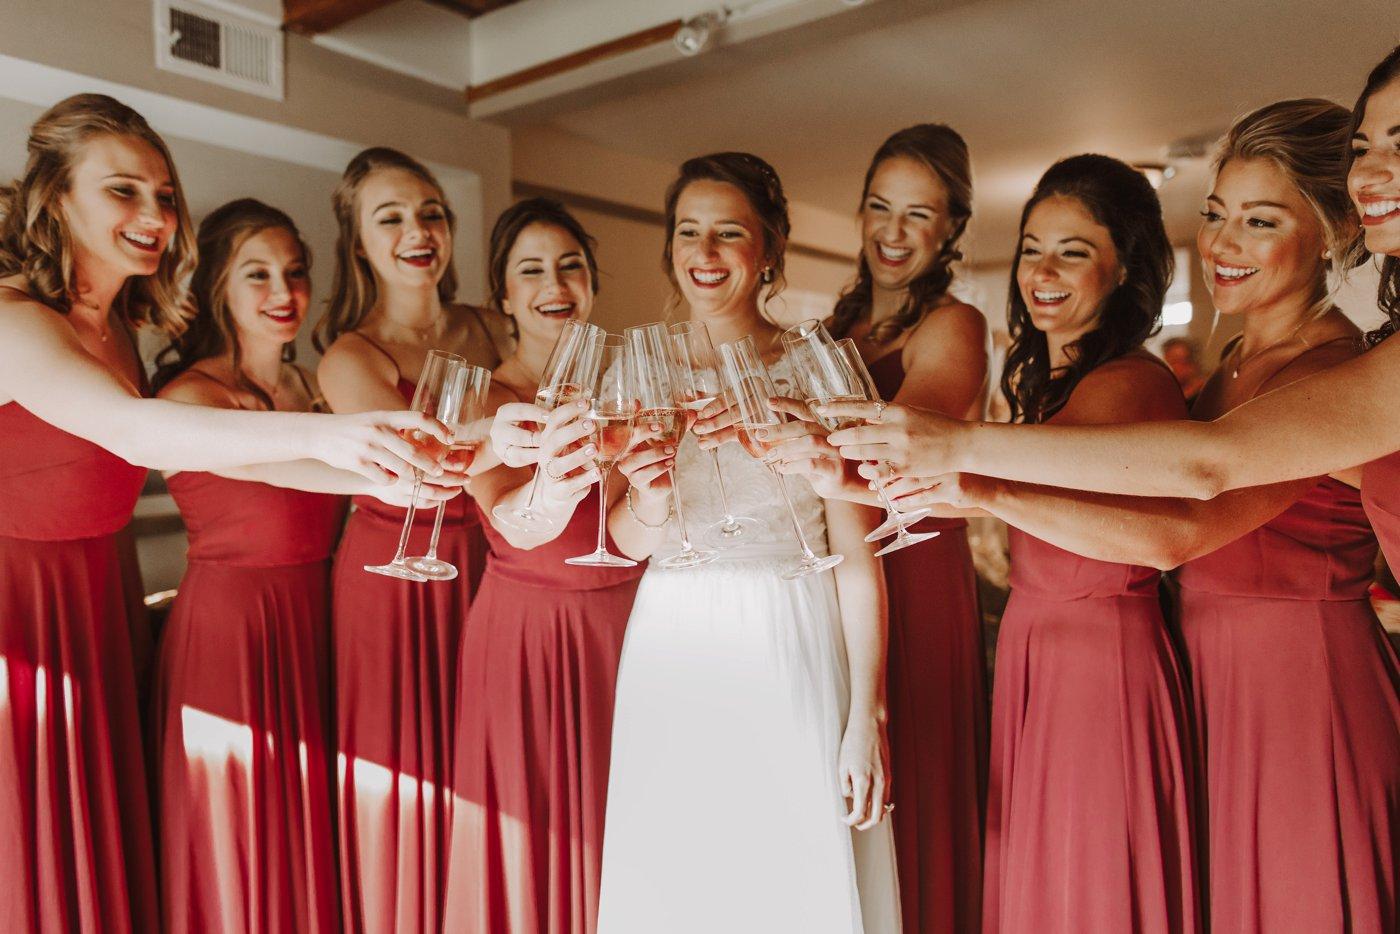 Downtown Annapolis USNA wedding bridesmaids first look Annapolis wedding photographer